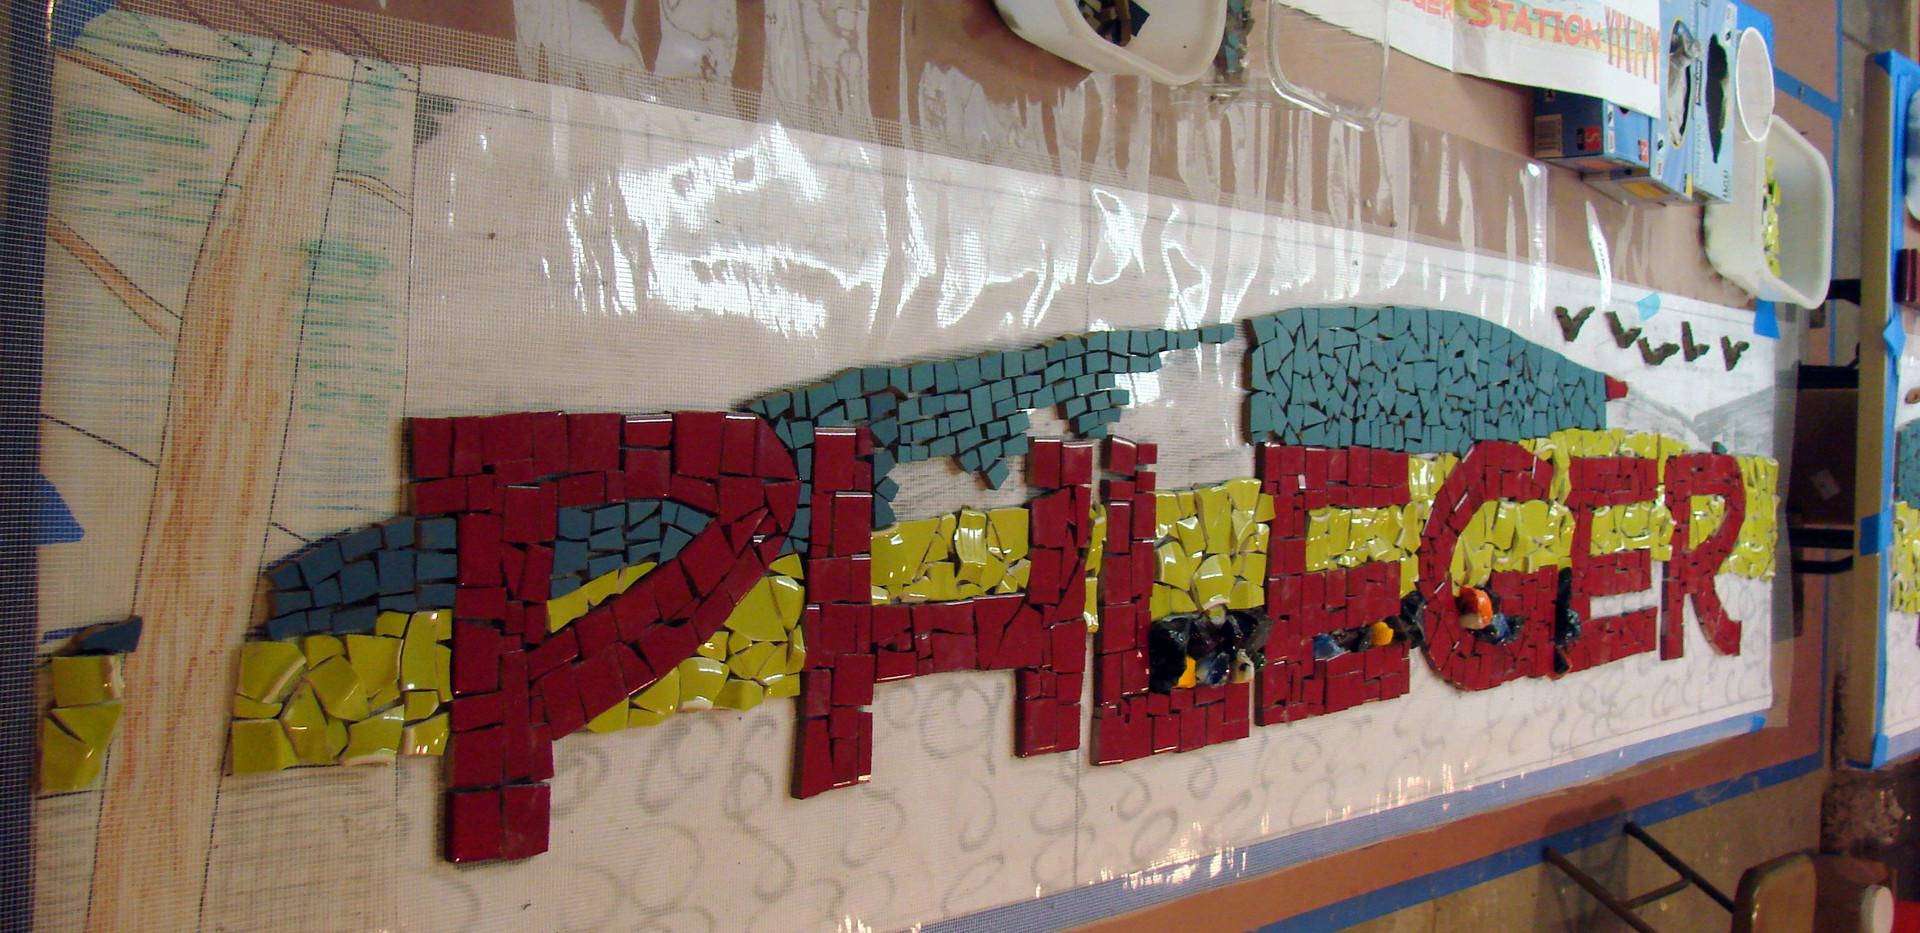 The Phleger signage